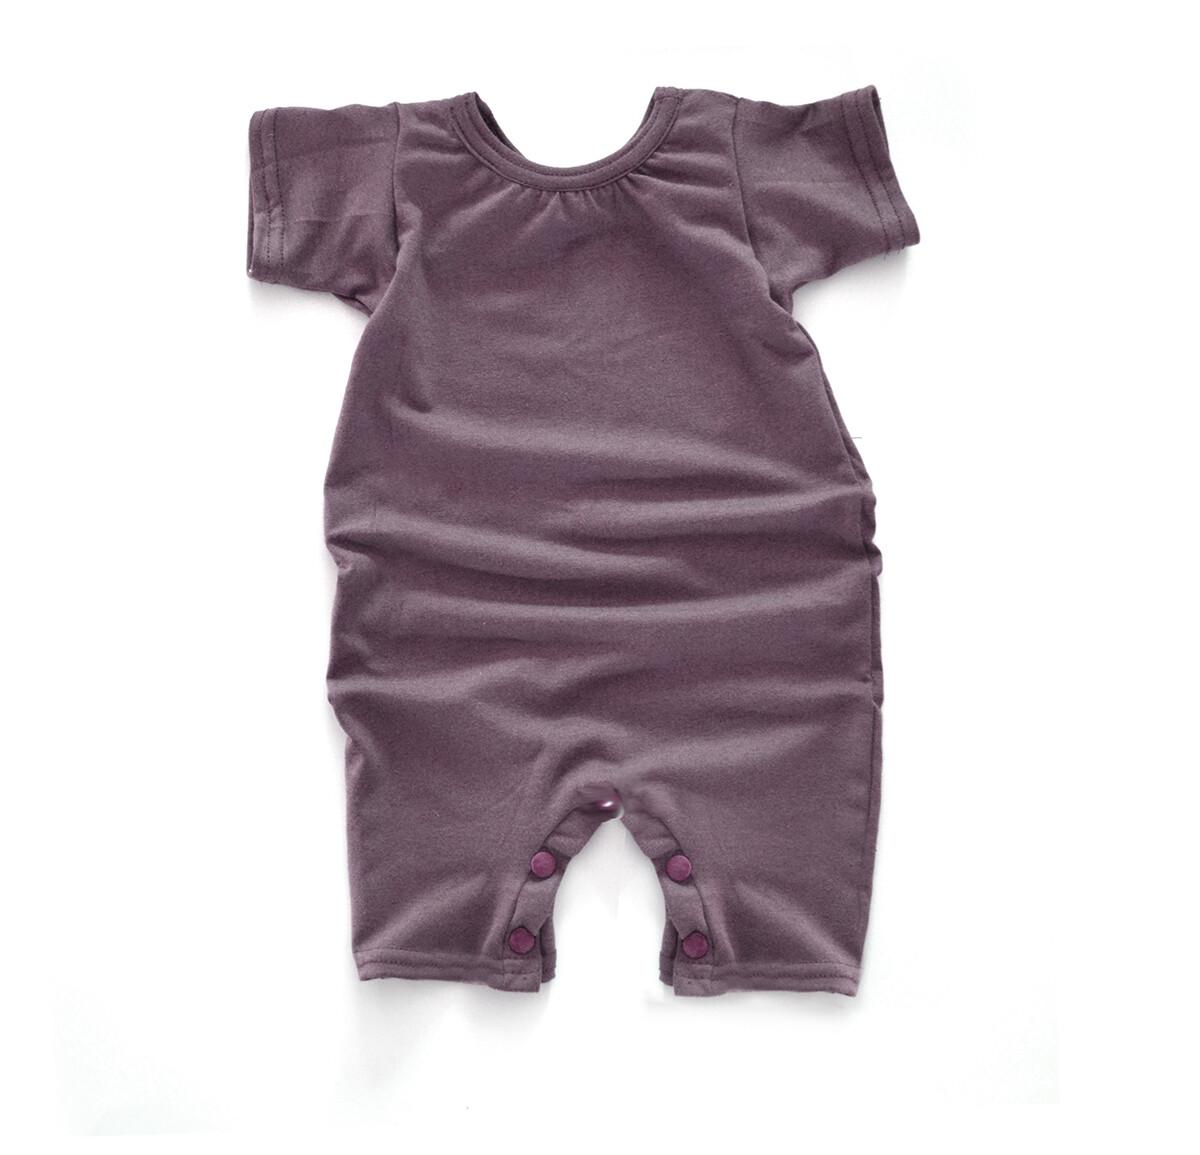 Little Sprout Short Sleeve Baby Romper - Tencel - Mauve